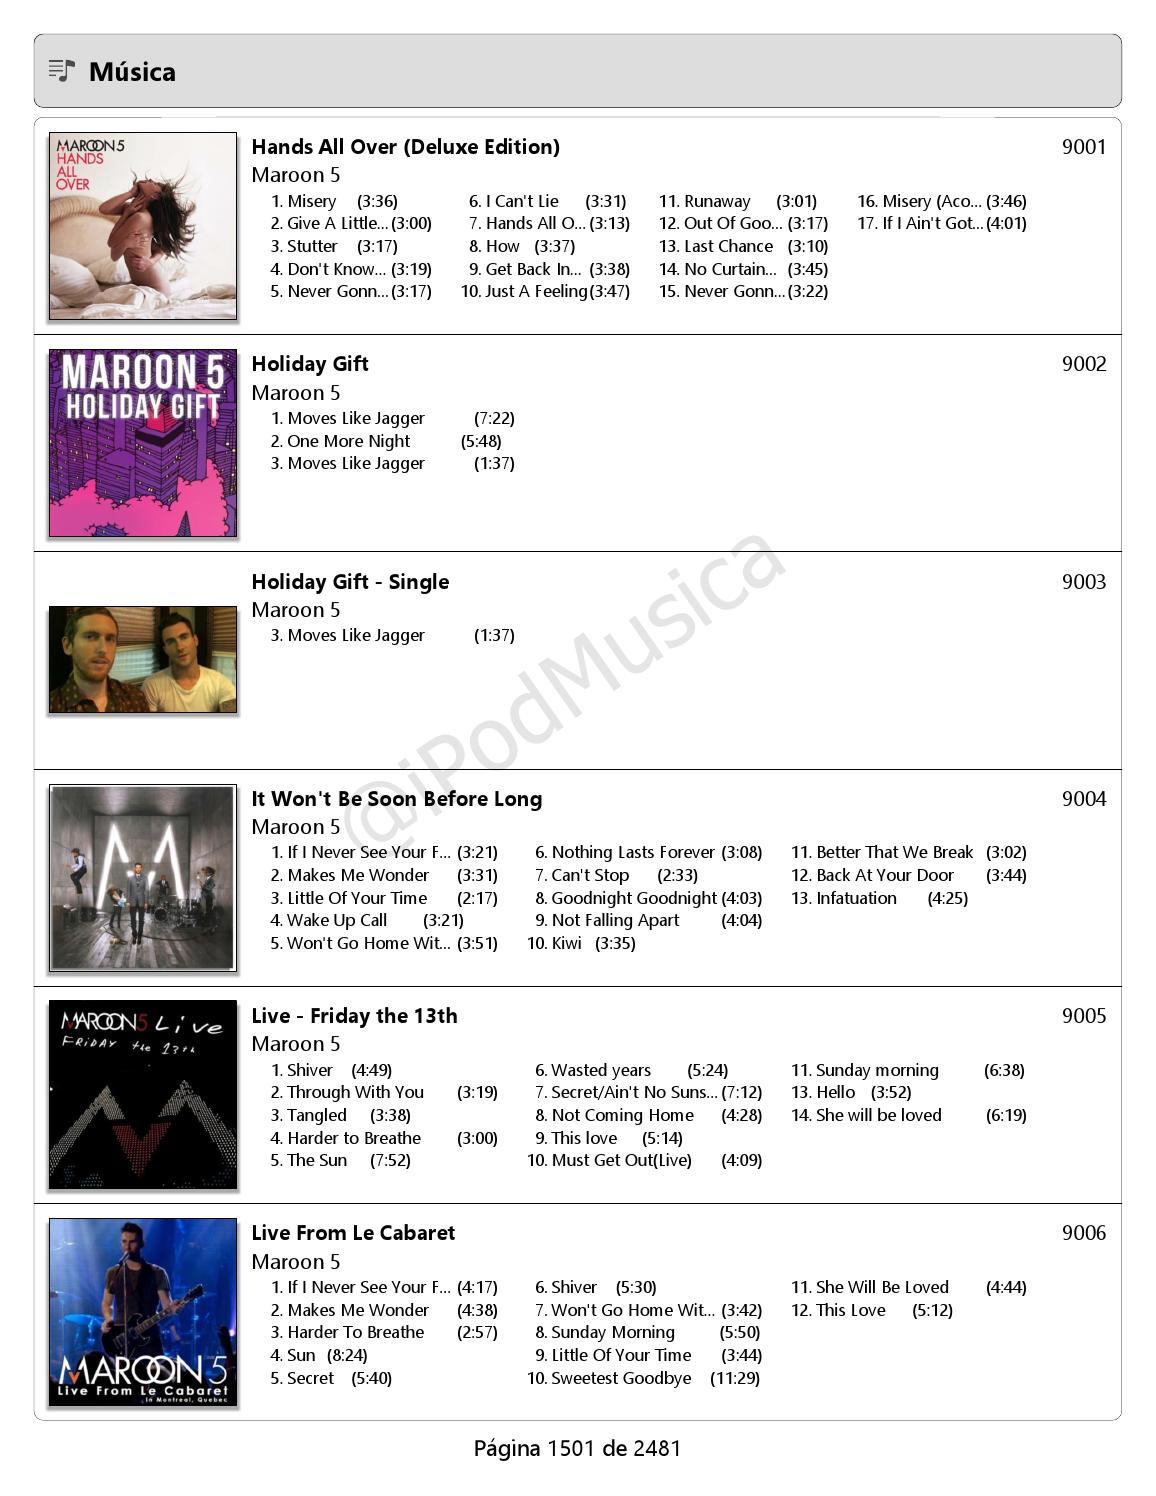 Catálogo Musical 12 2014 45 Ordenado Por Artista De La M